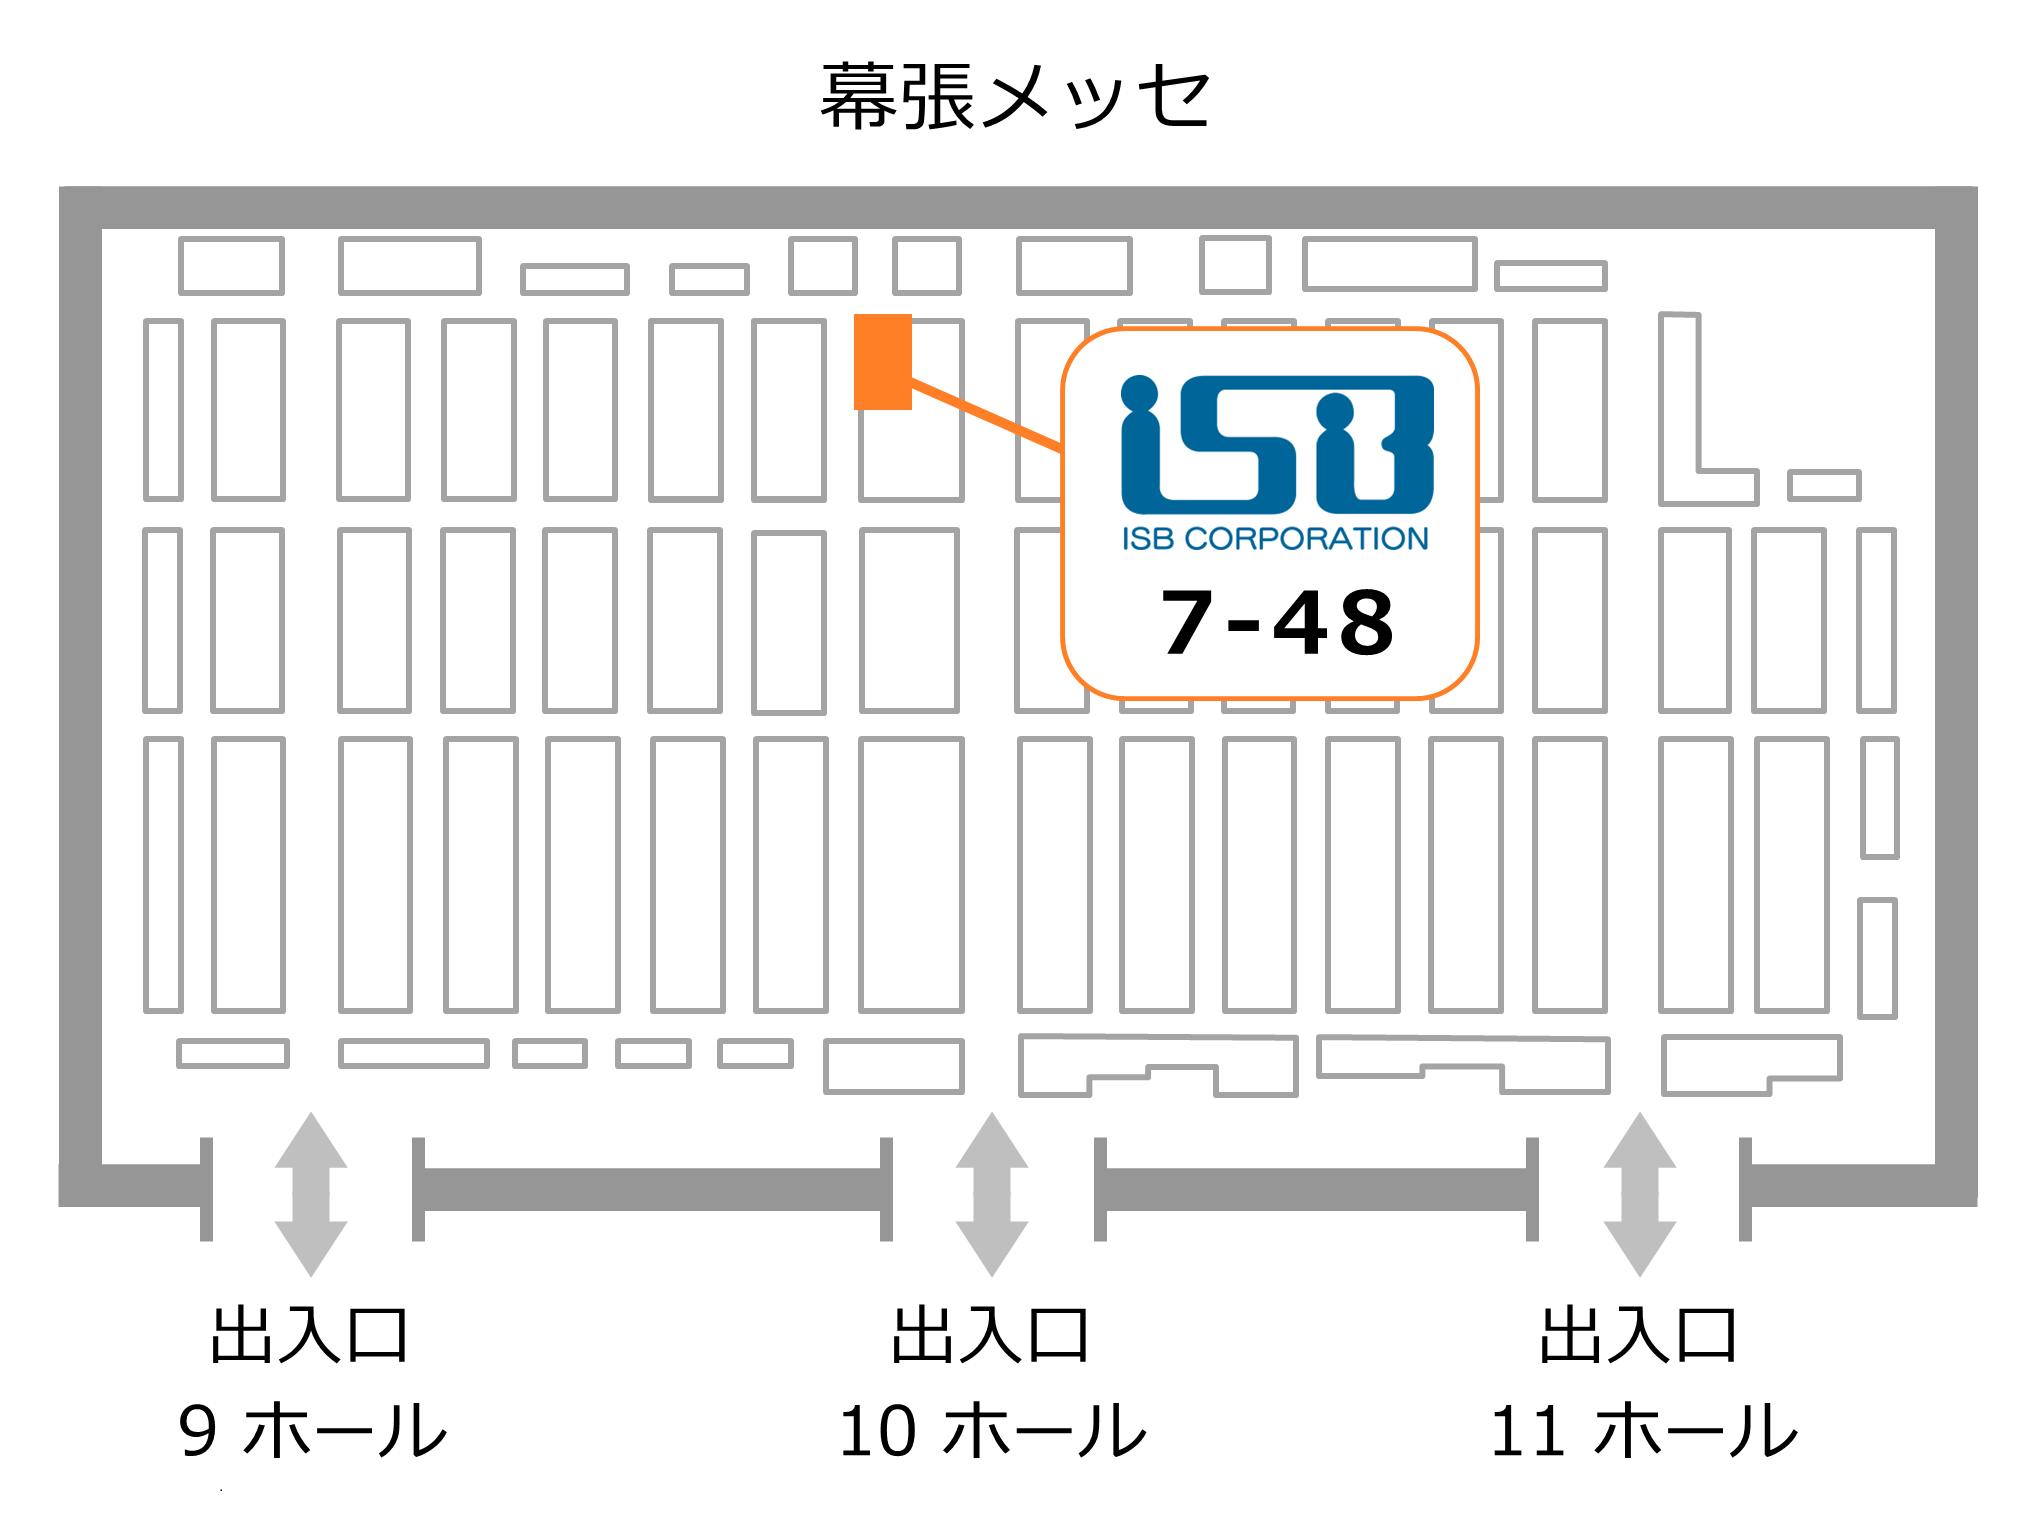 medical-japan-tokyo-2020-boothloc-print-res.png